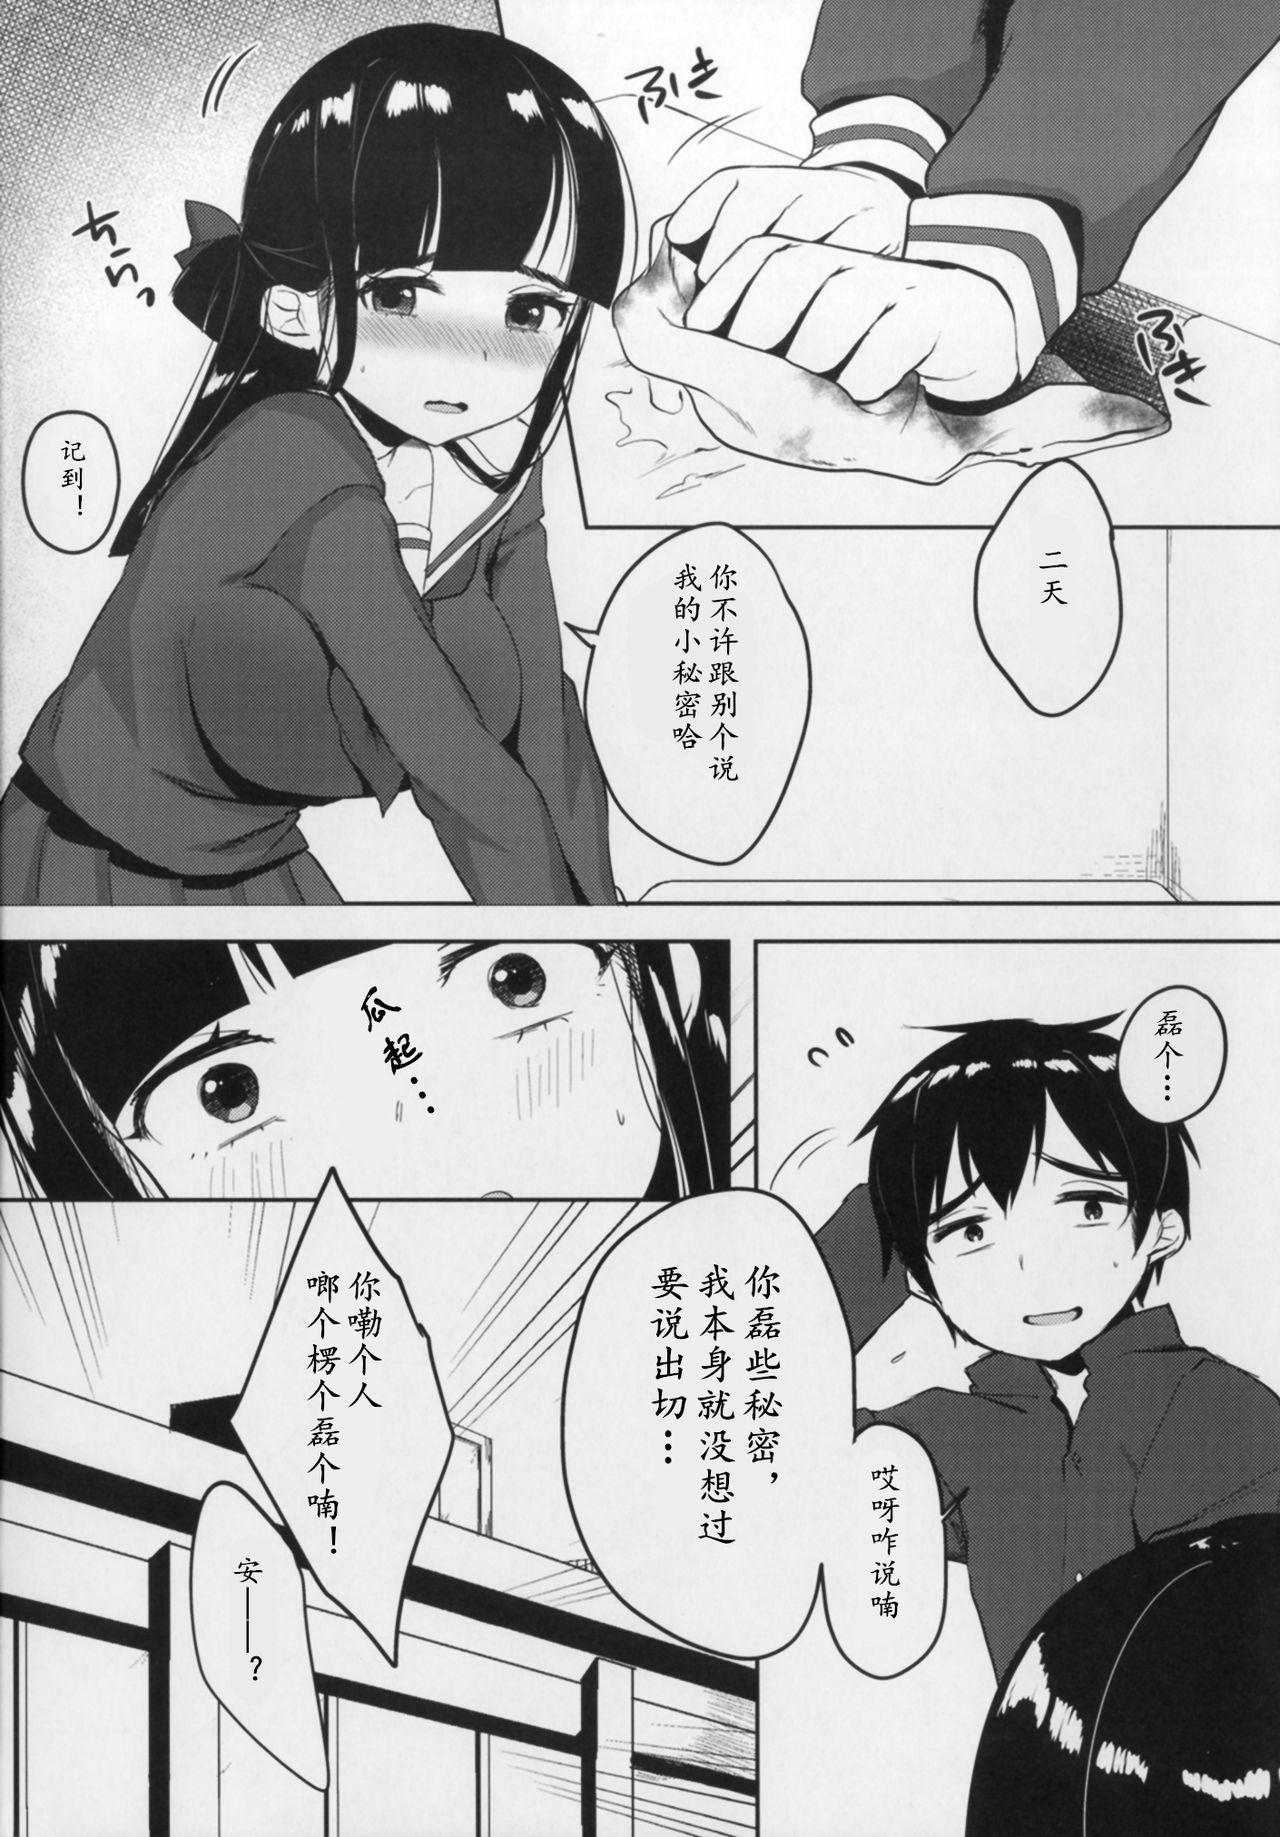 Himitsu no Tights | 秘密的黑丝 23